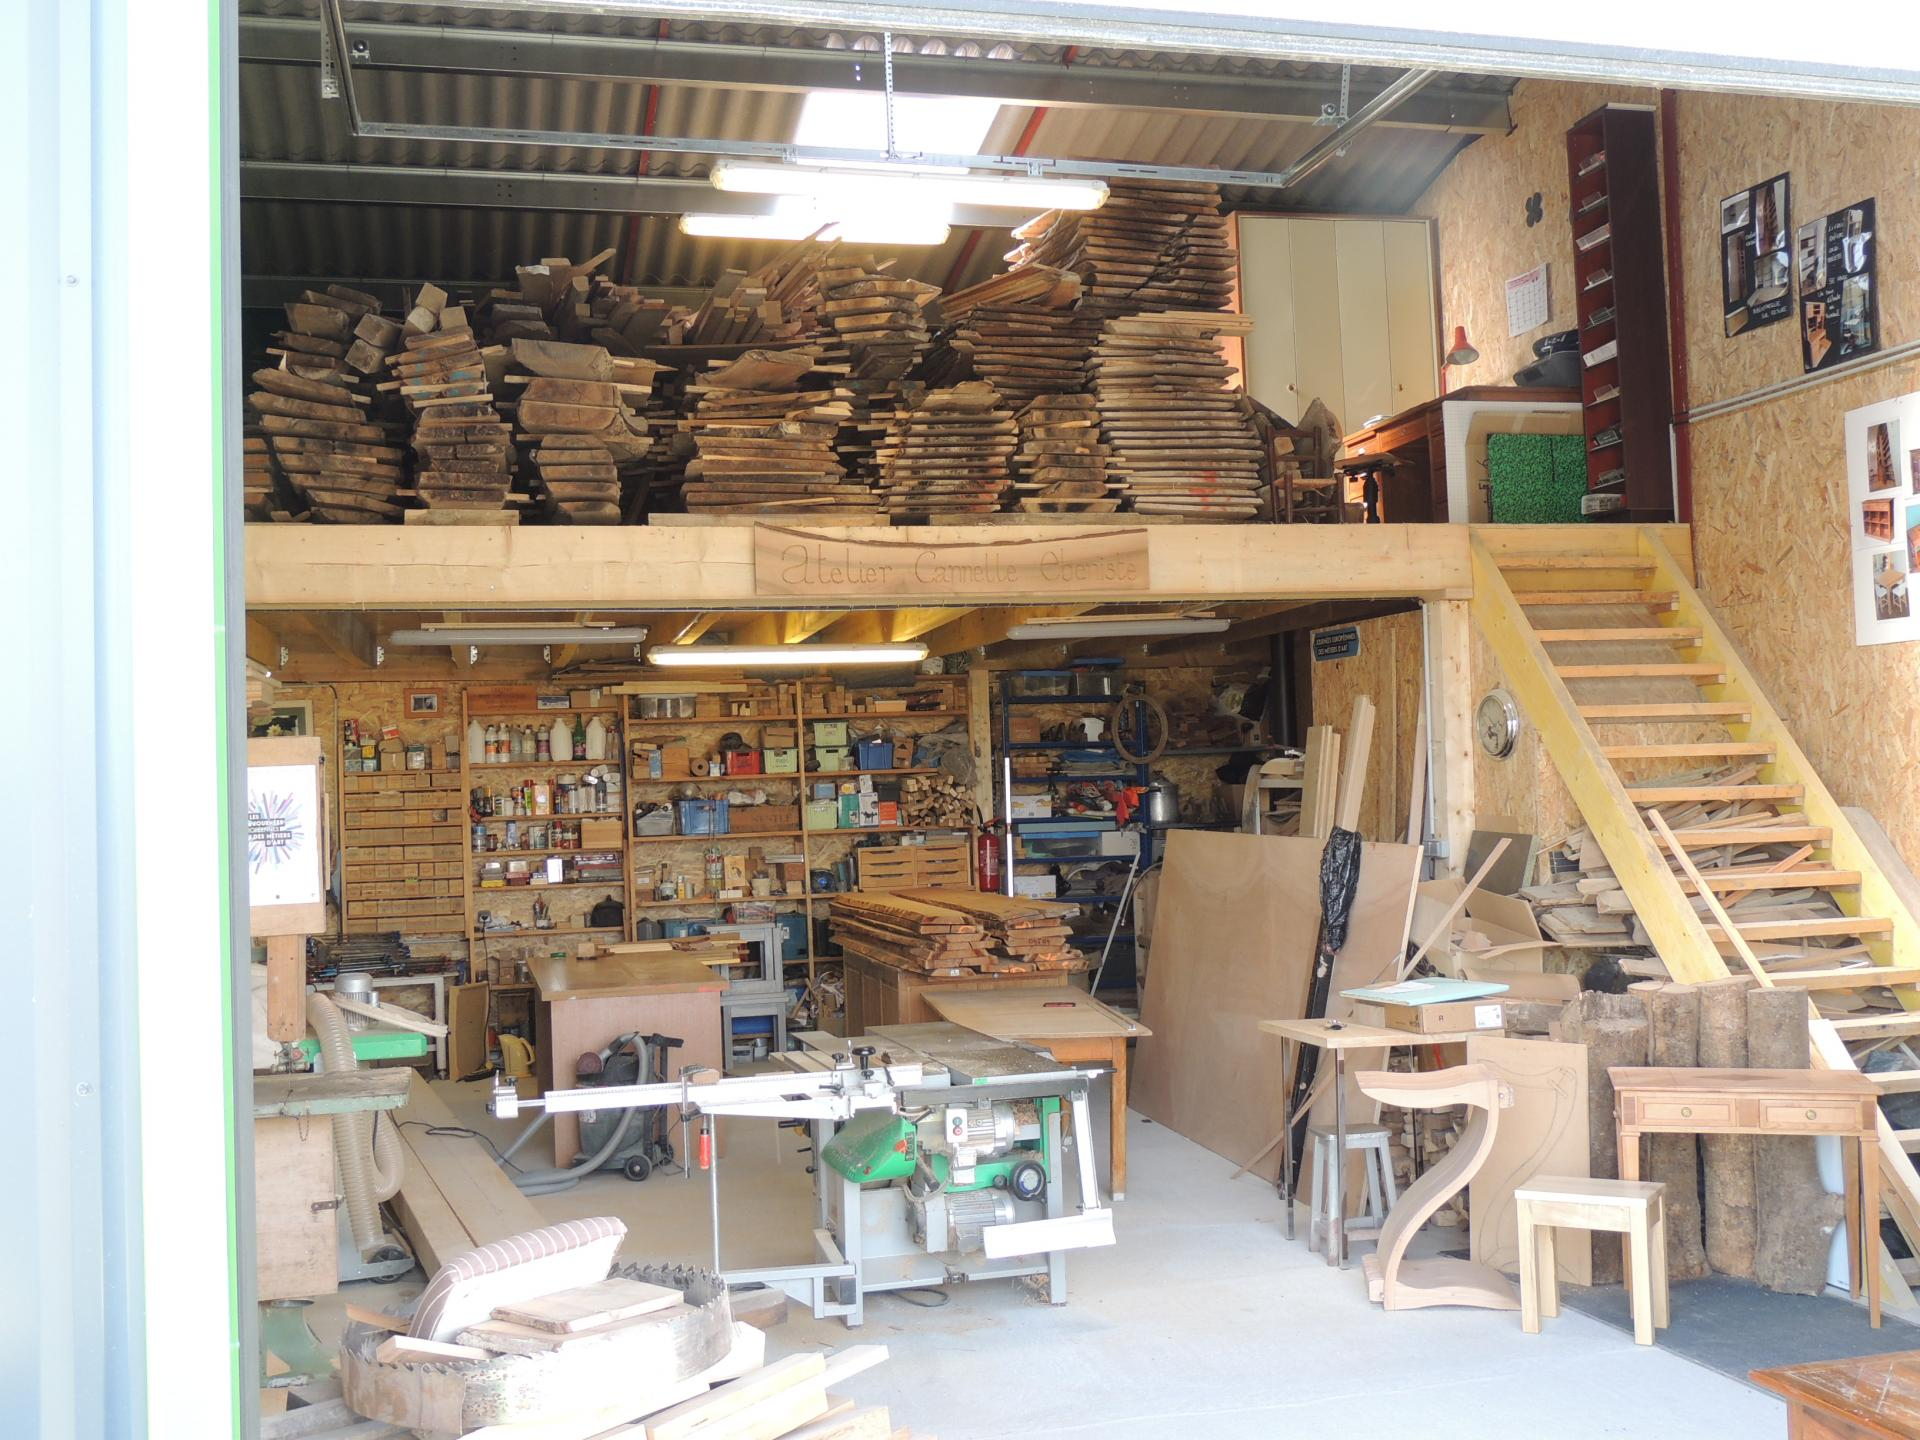 Atelier Cannelle - La Rochelle